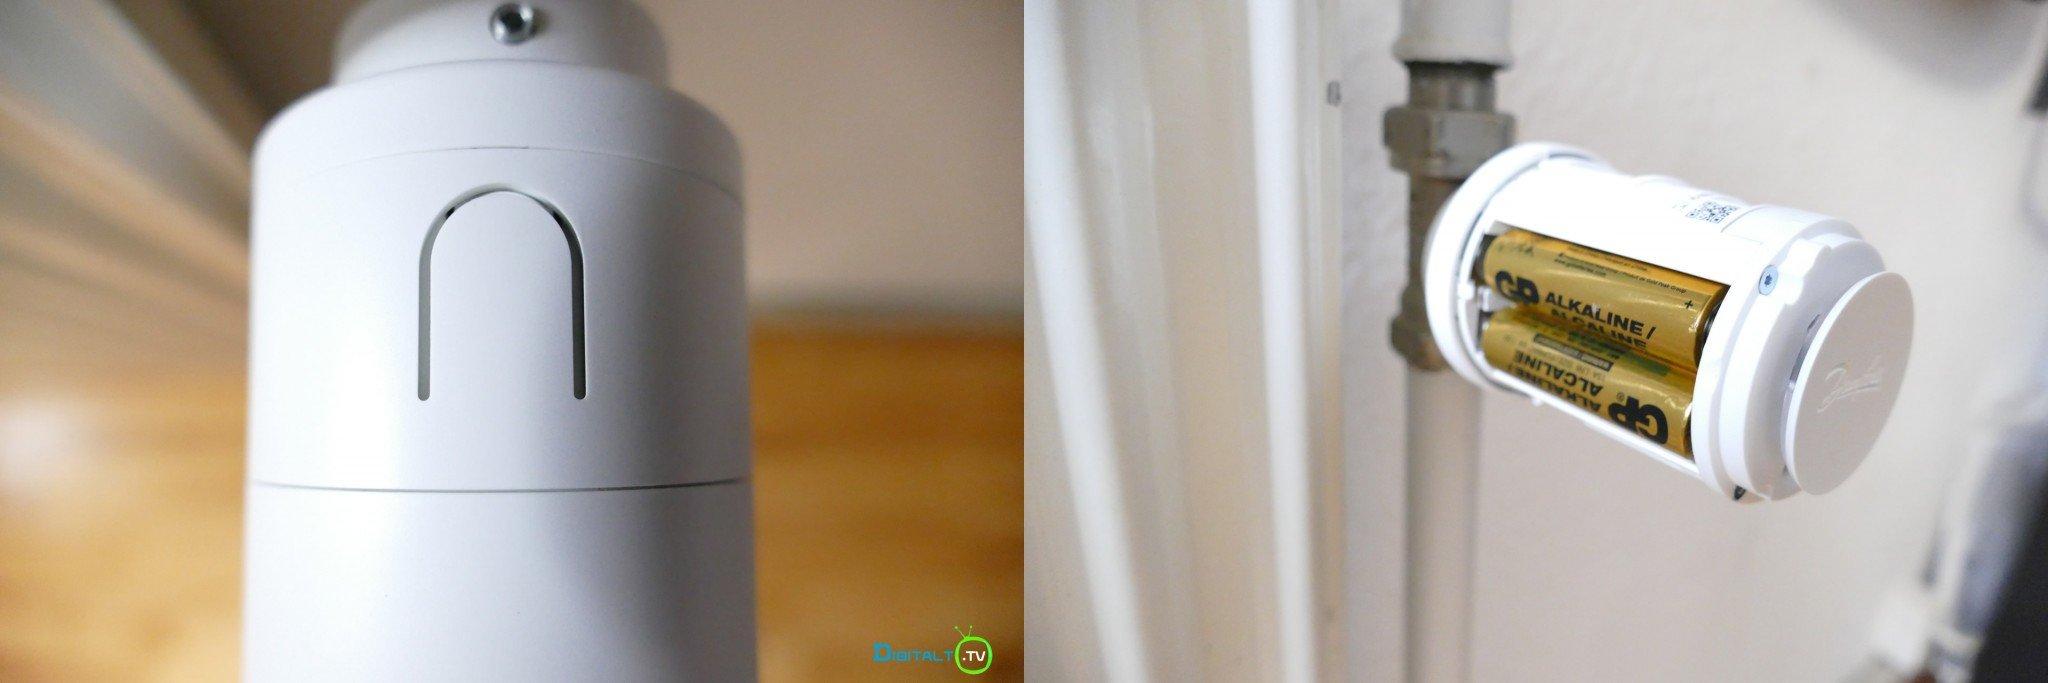 Danfoss Eco montering batteri